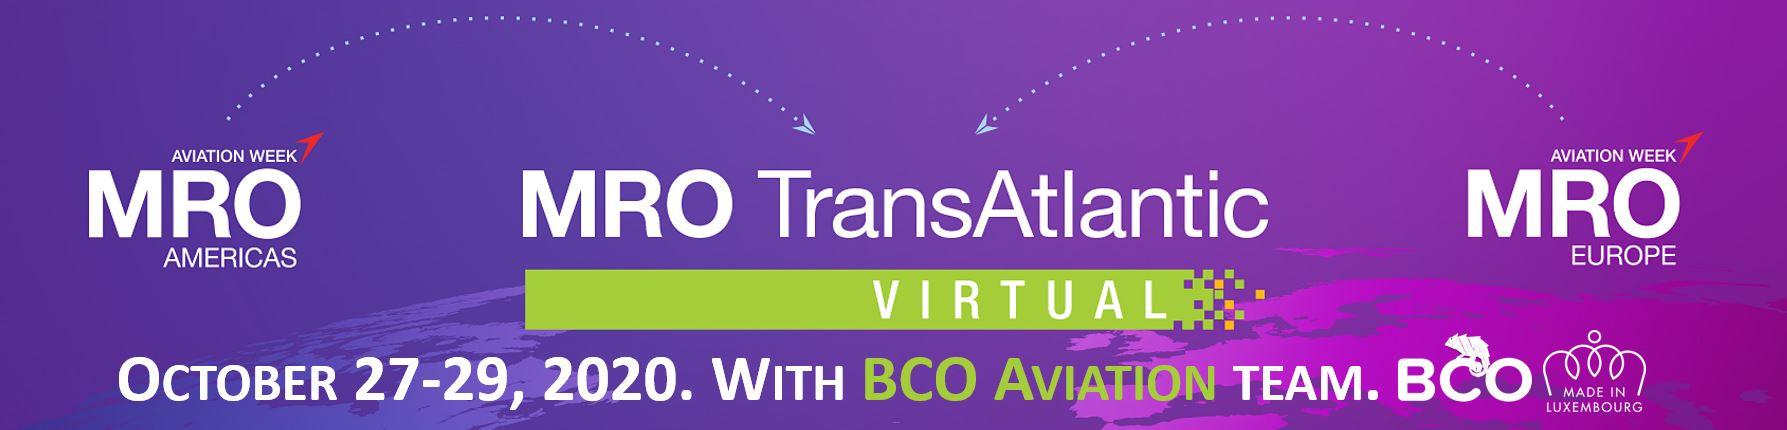 Illustration for: BCO Aviation is joining the MRO TransAtlantic